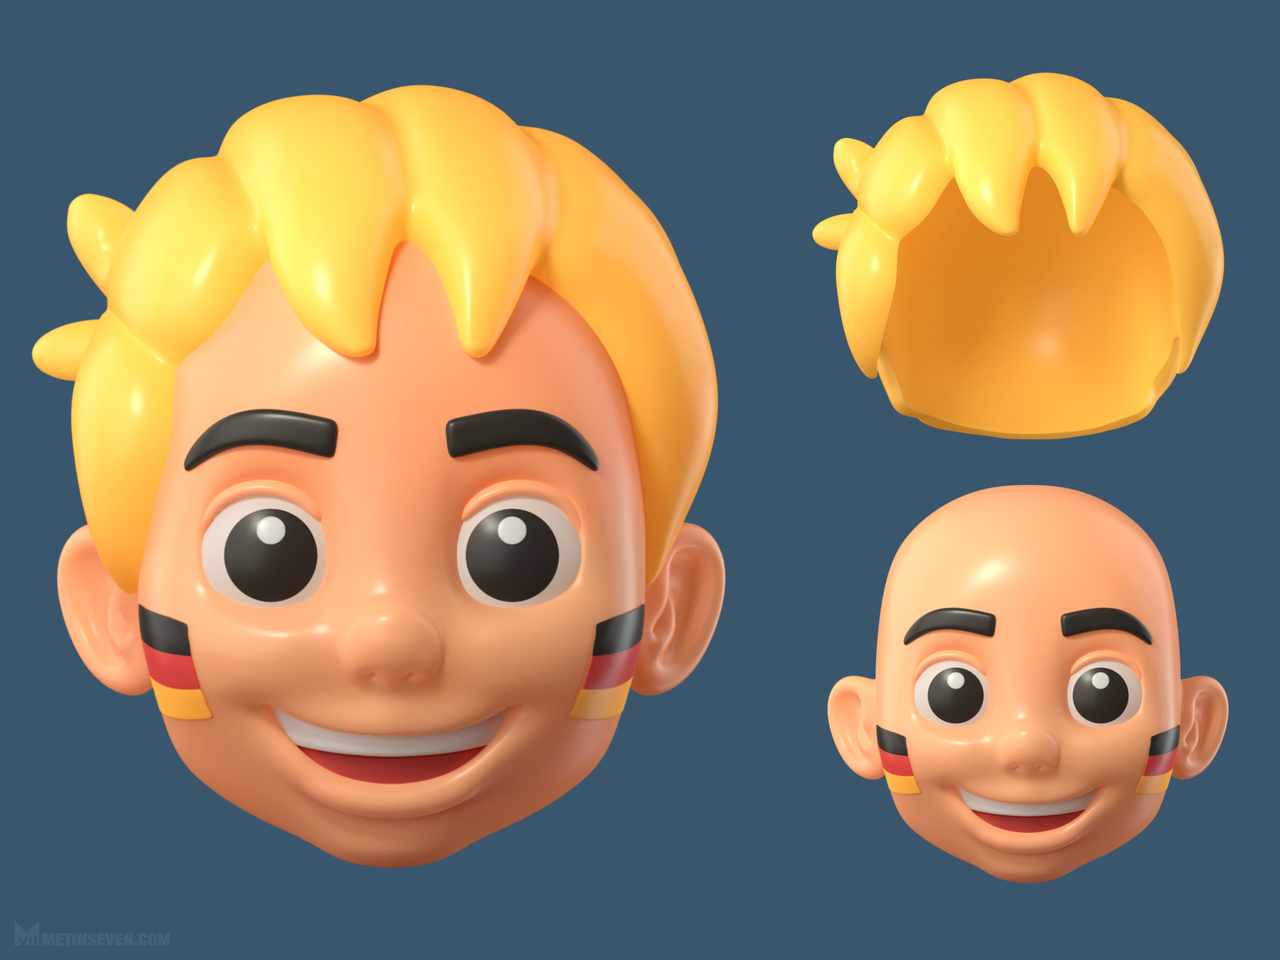 3D character designer • 3D print modeler • Toy sculptor